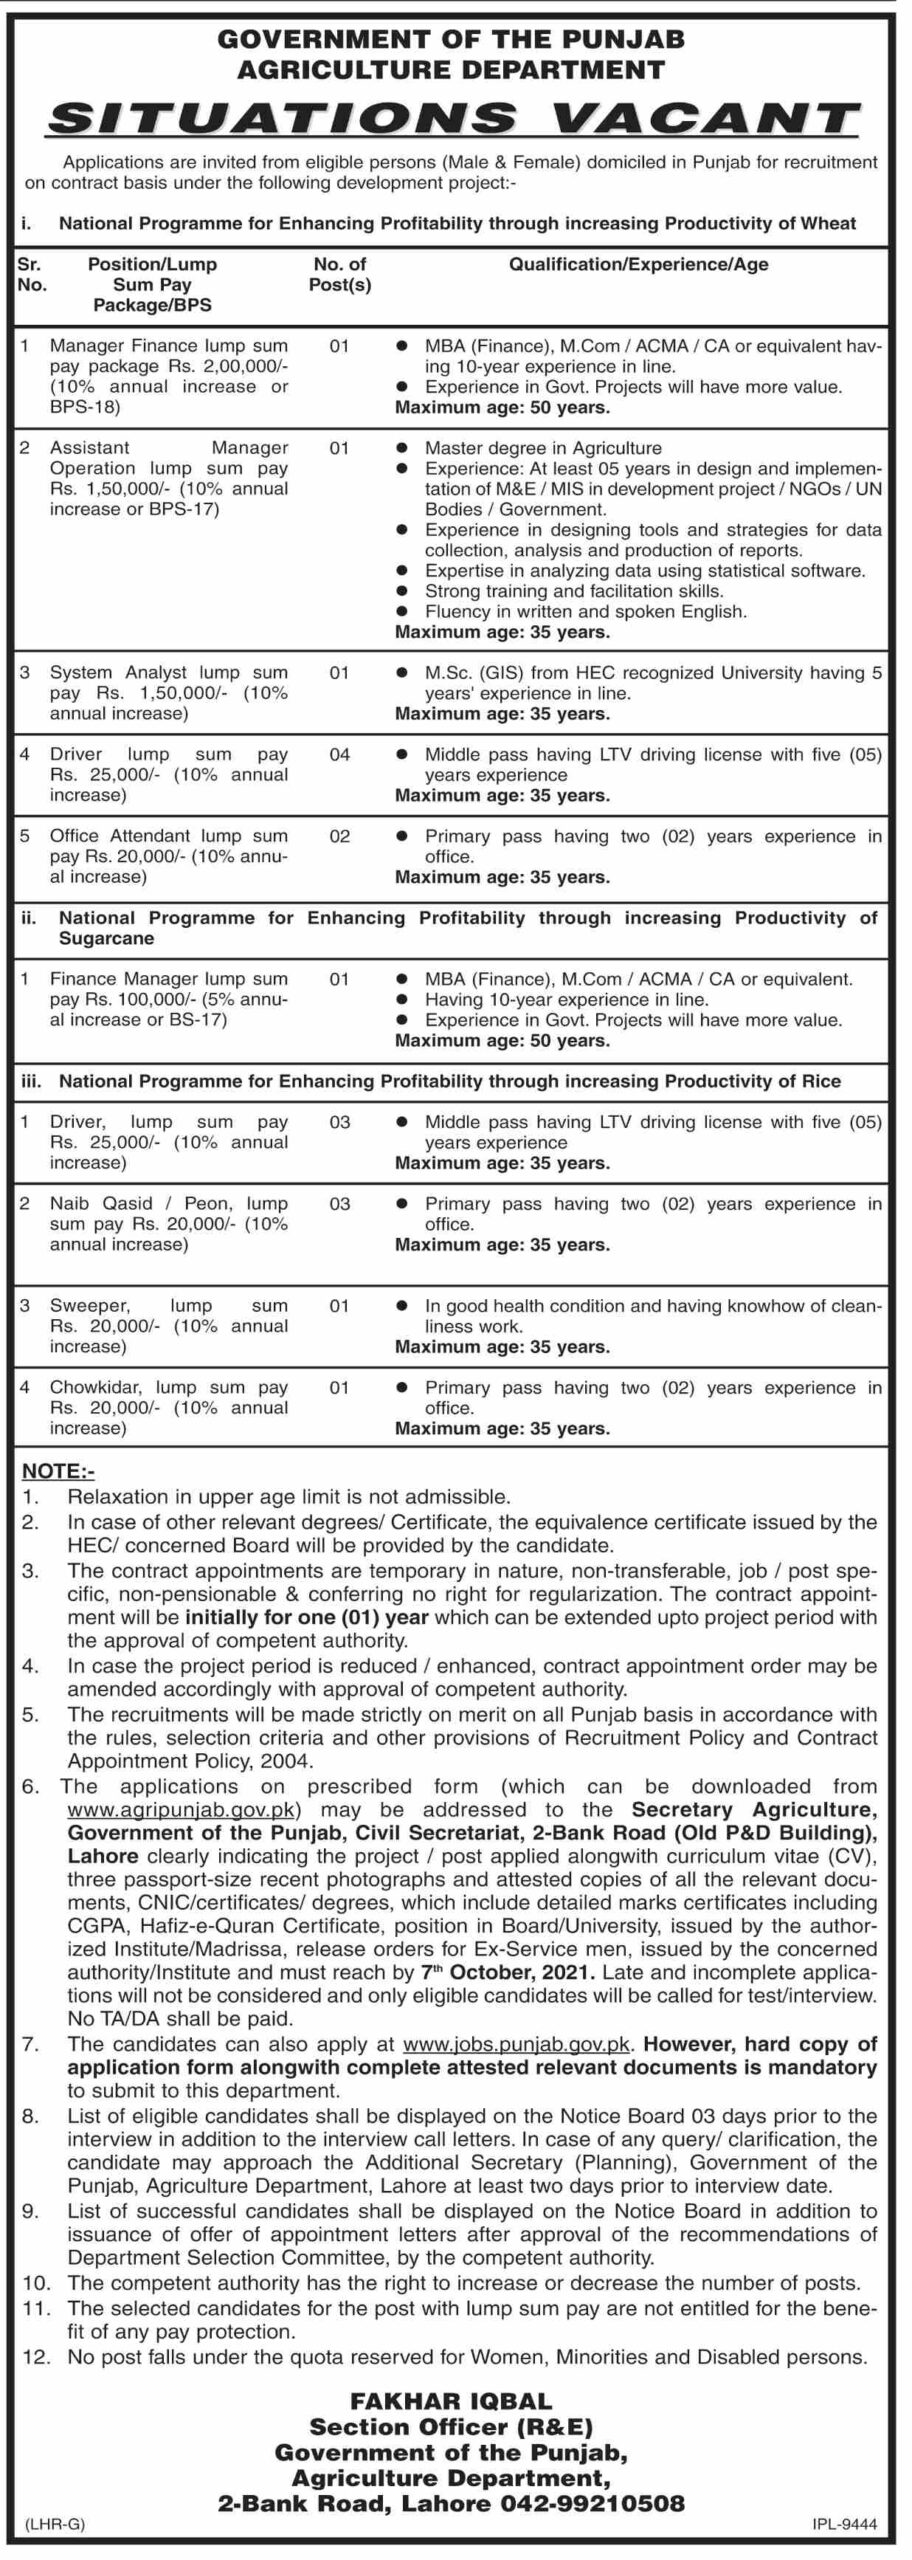 Govt Jobs Punjab 2021 At Punjab Agriculture Department | 21 Posts